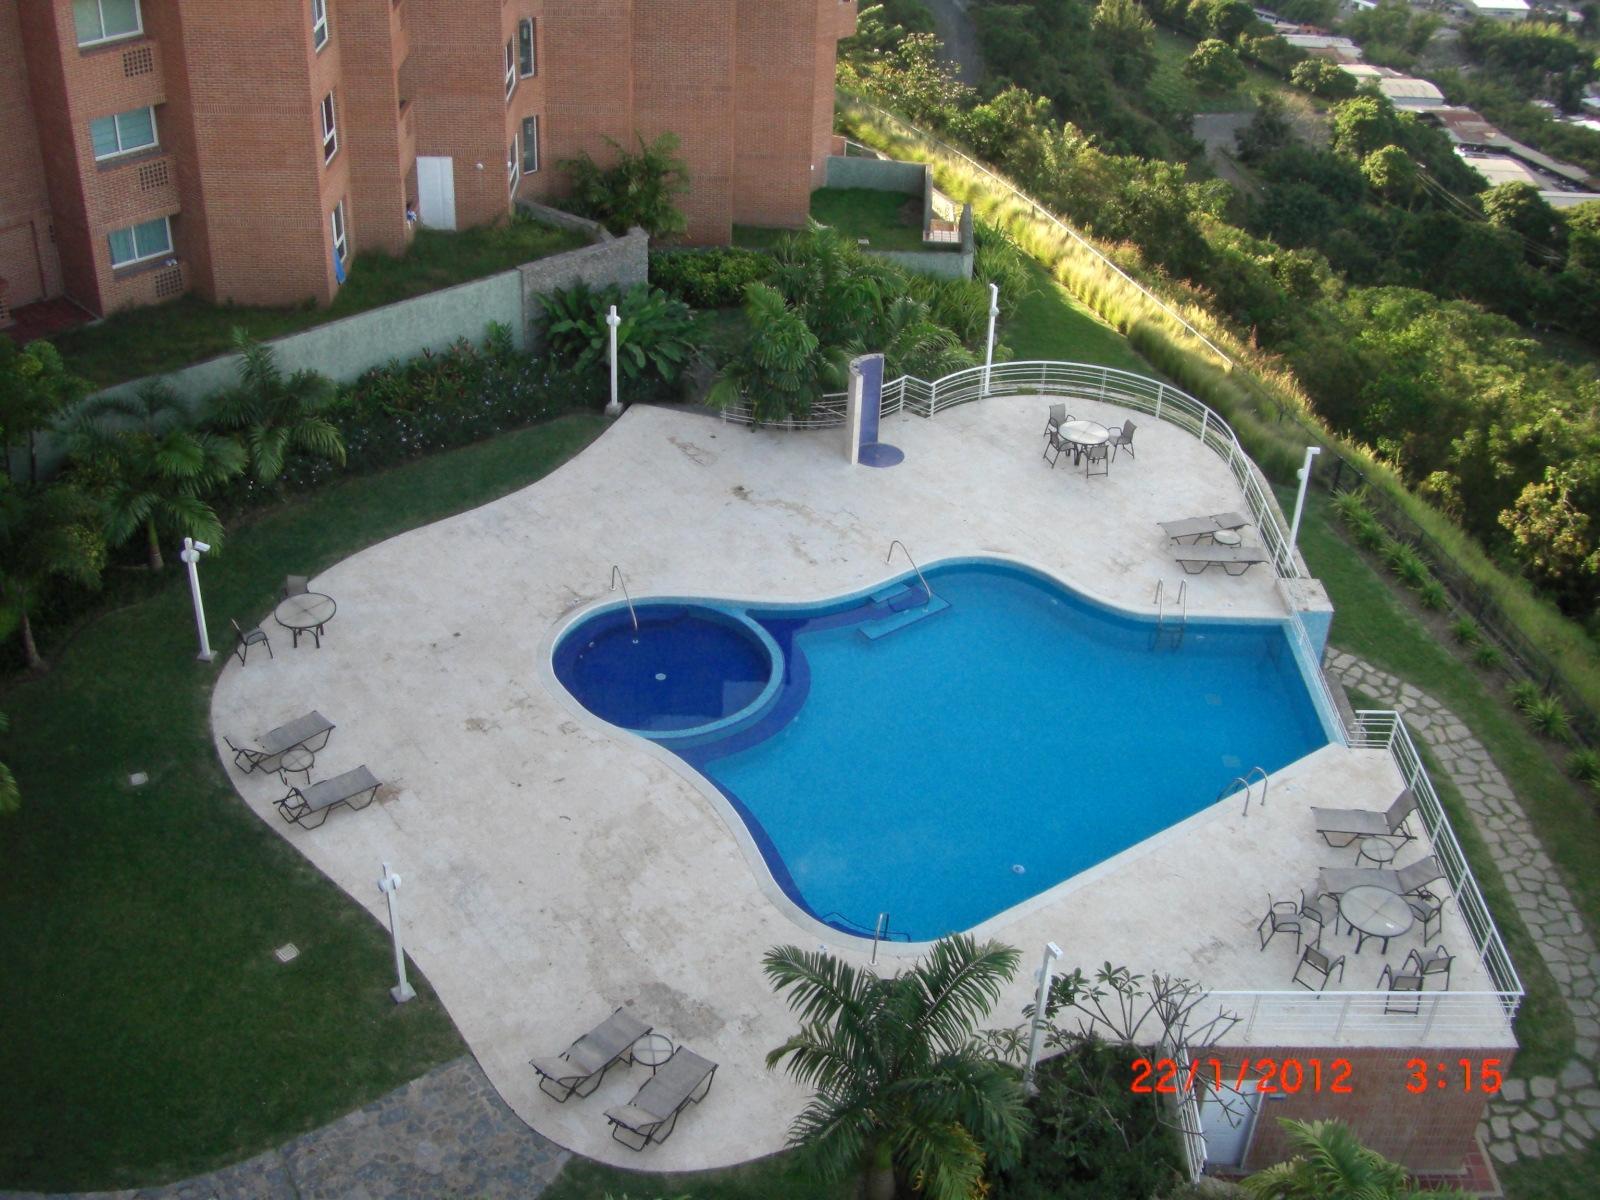 301 moved permanently - Piscinas y jardines ...